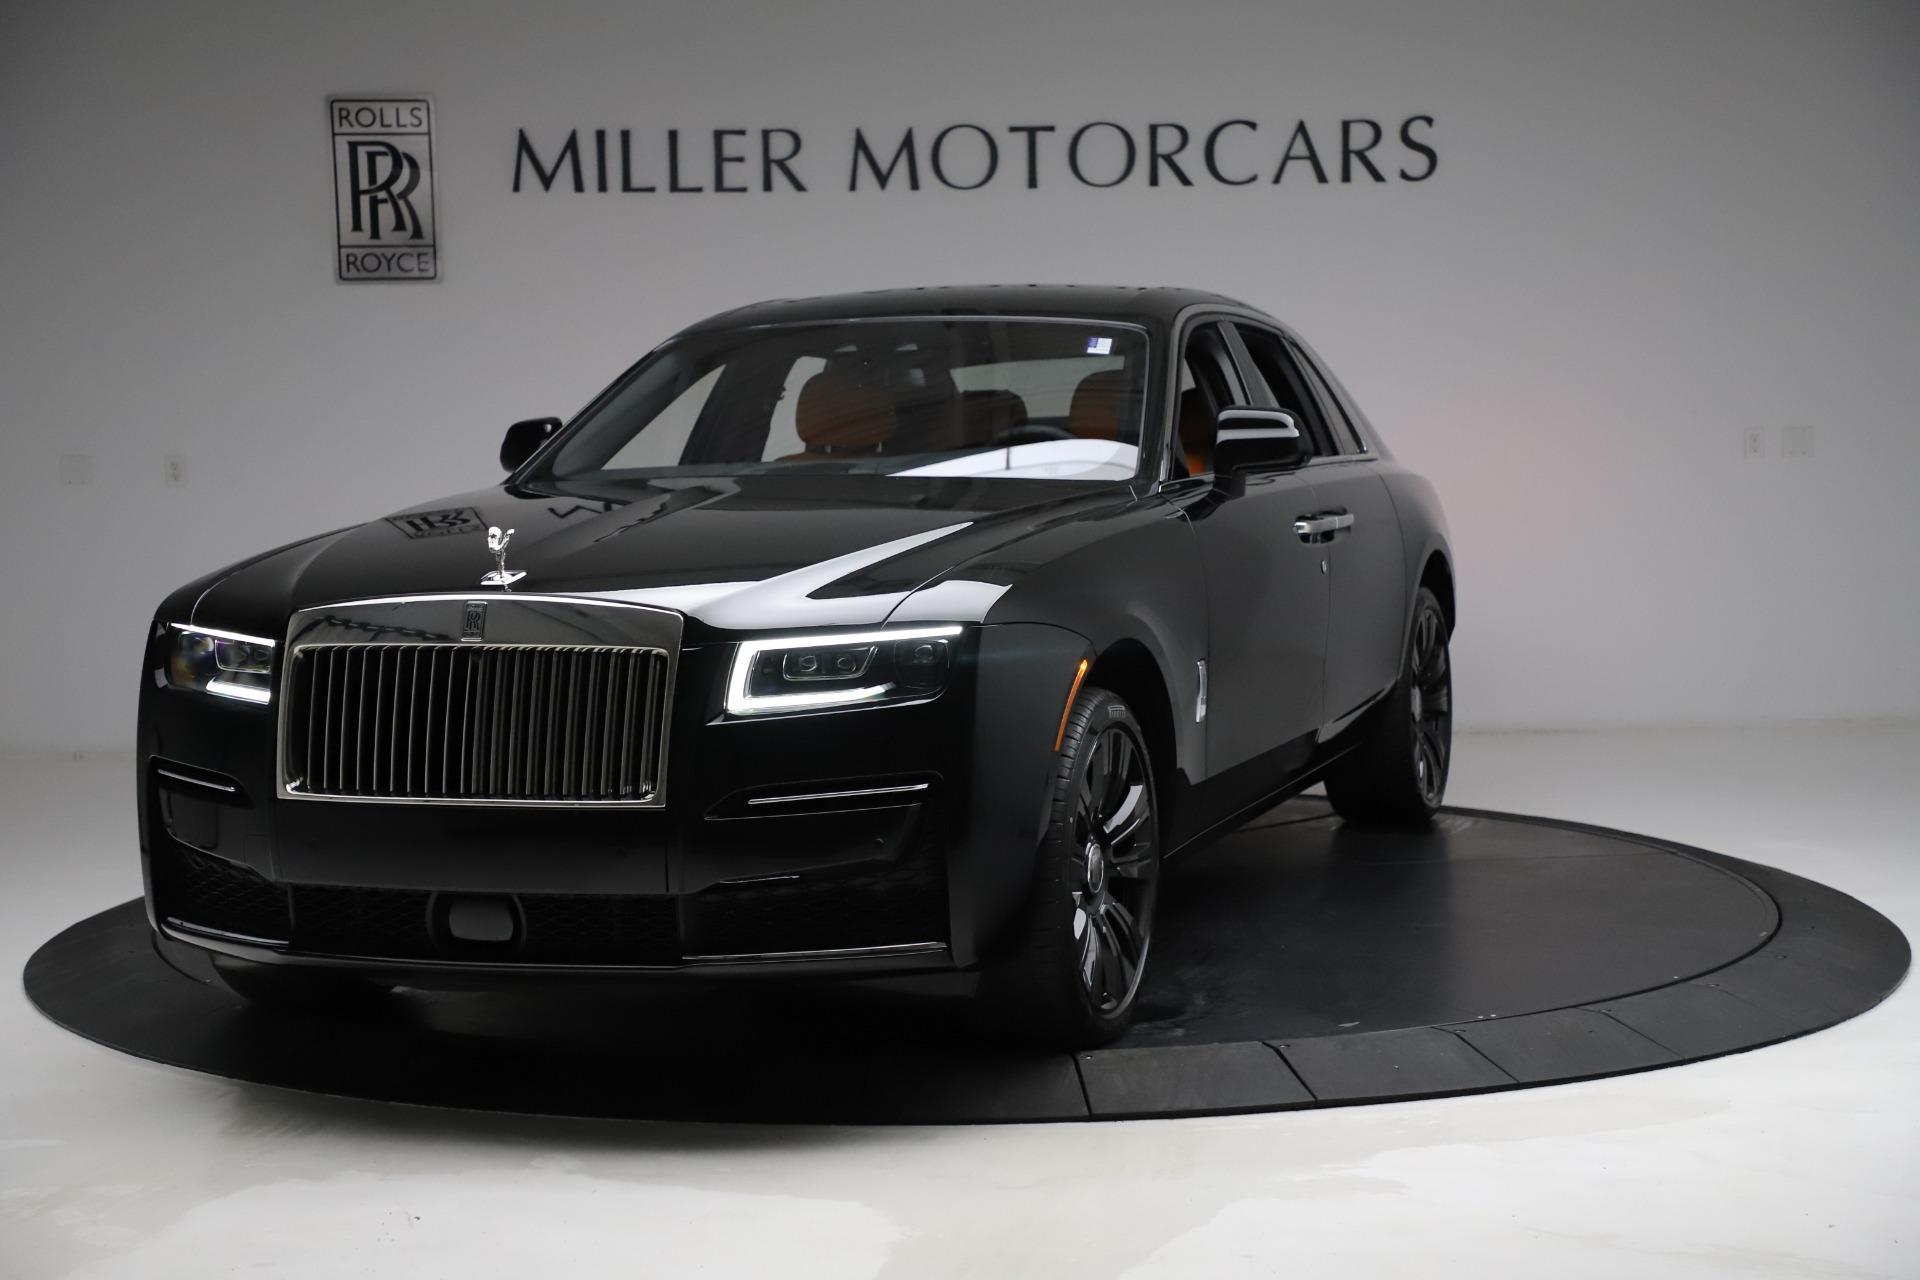 New 2021 Rolls-Royce Ghost for sale Sold at Maserati of Westport in Westport CT 06880 1